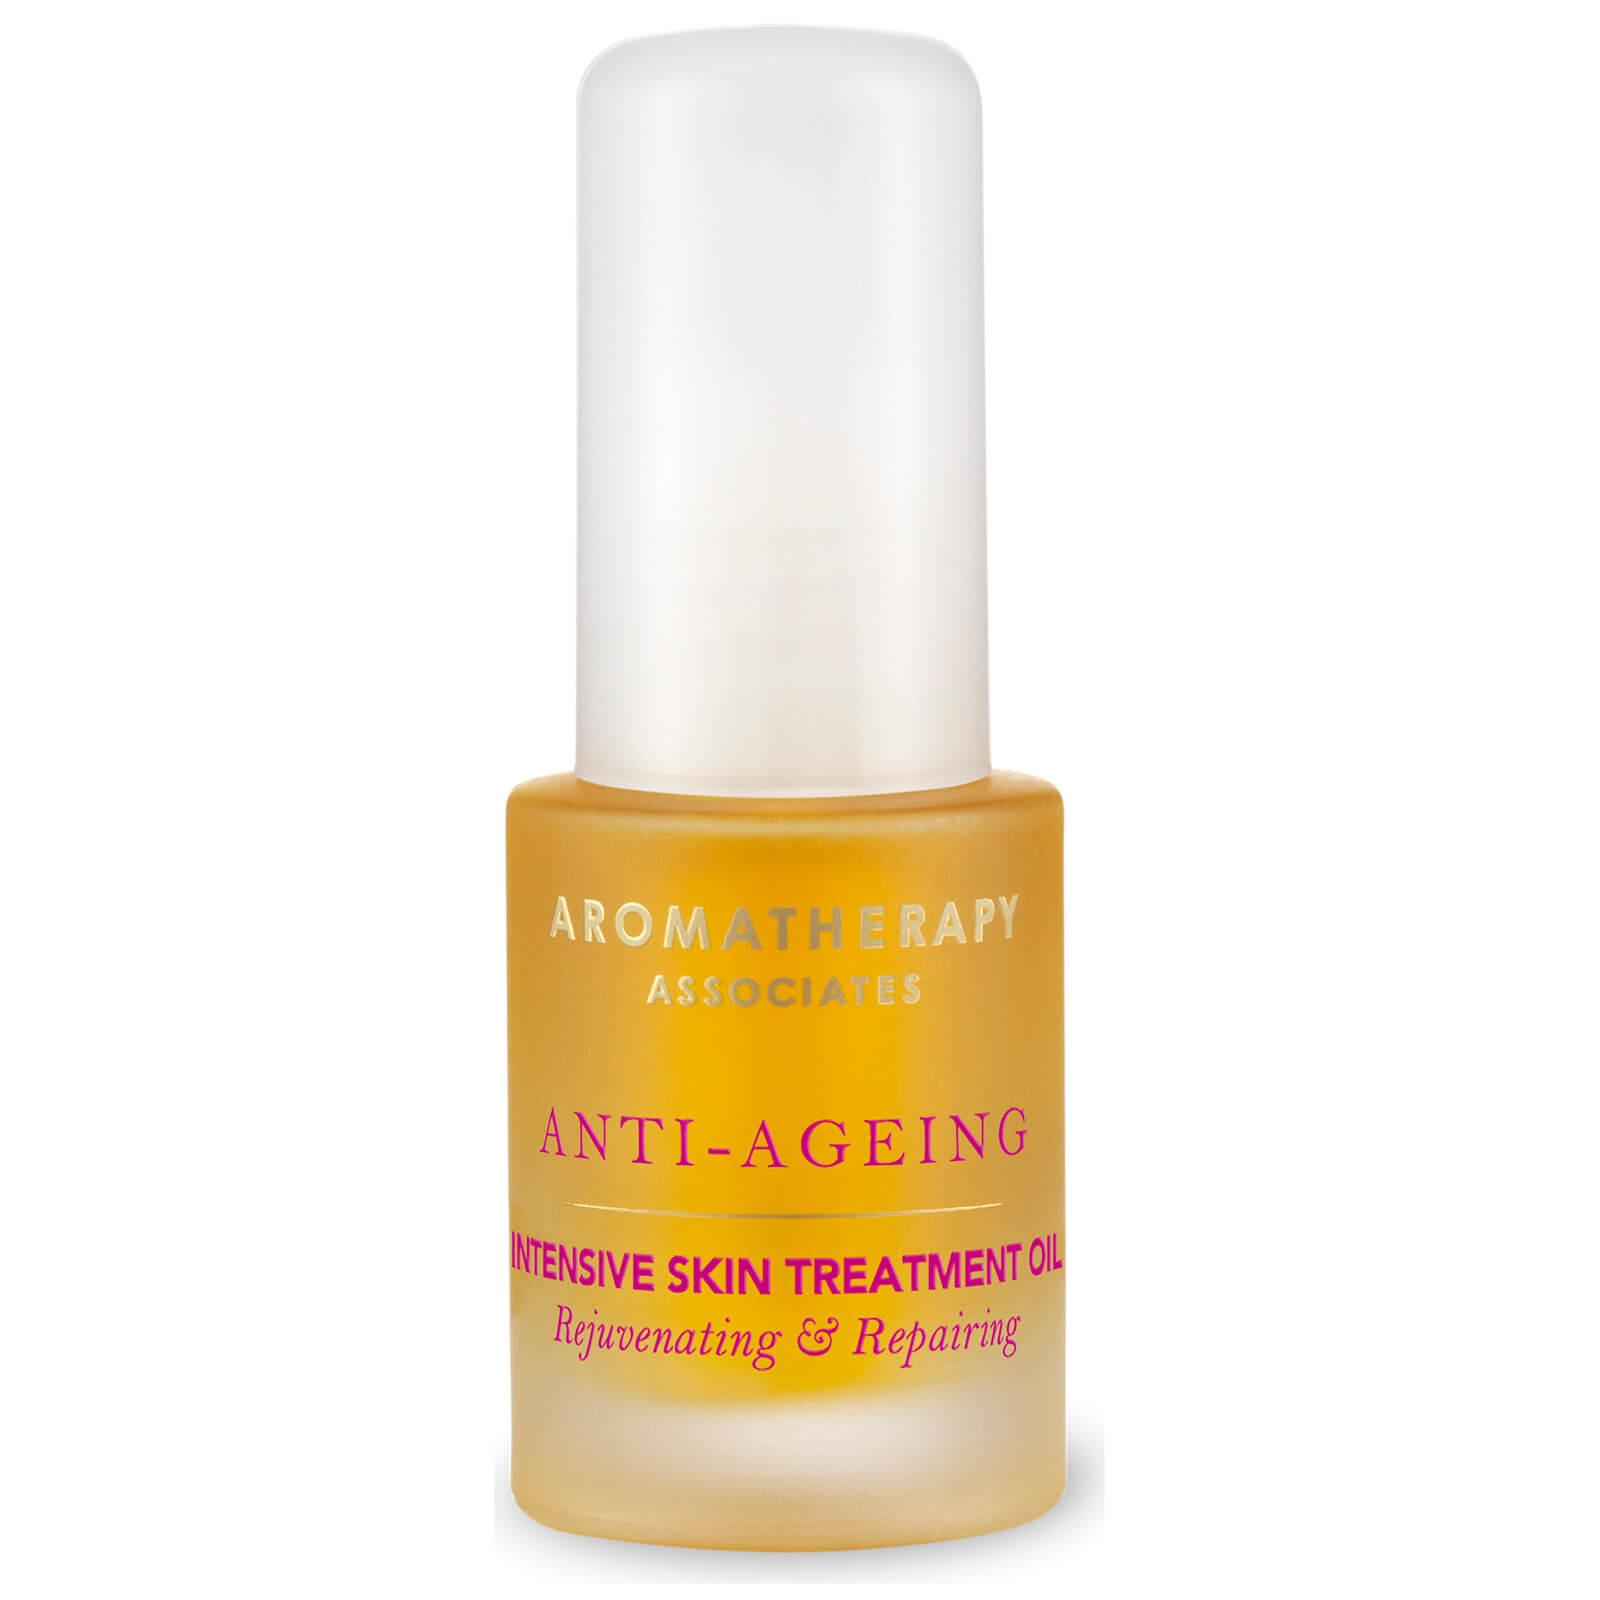 Look Fantastic coupon: Aromatherapy Associates Intensive Skin Treatment Oil 1oz